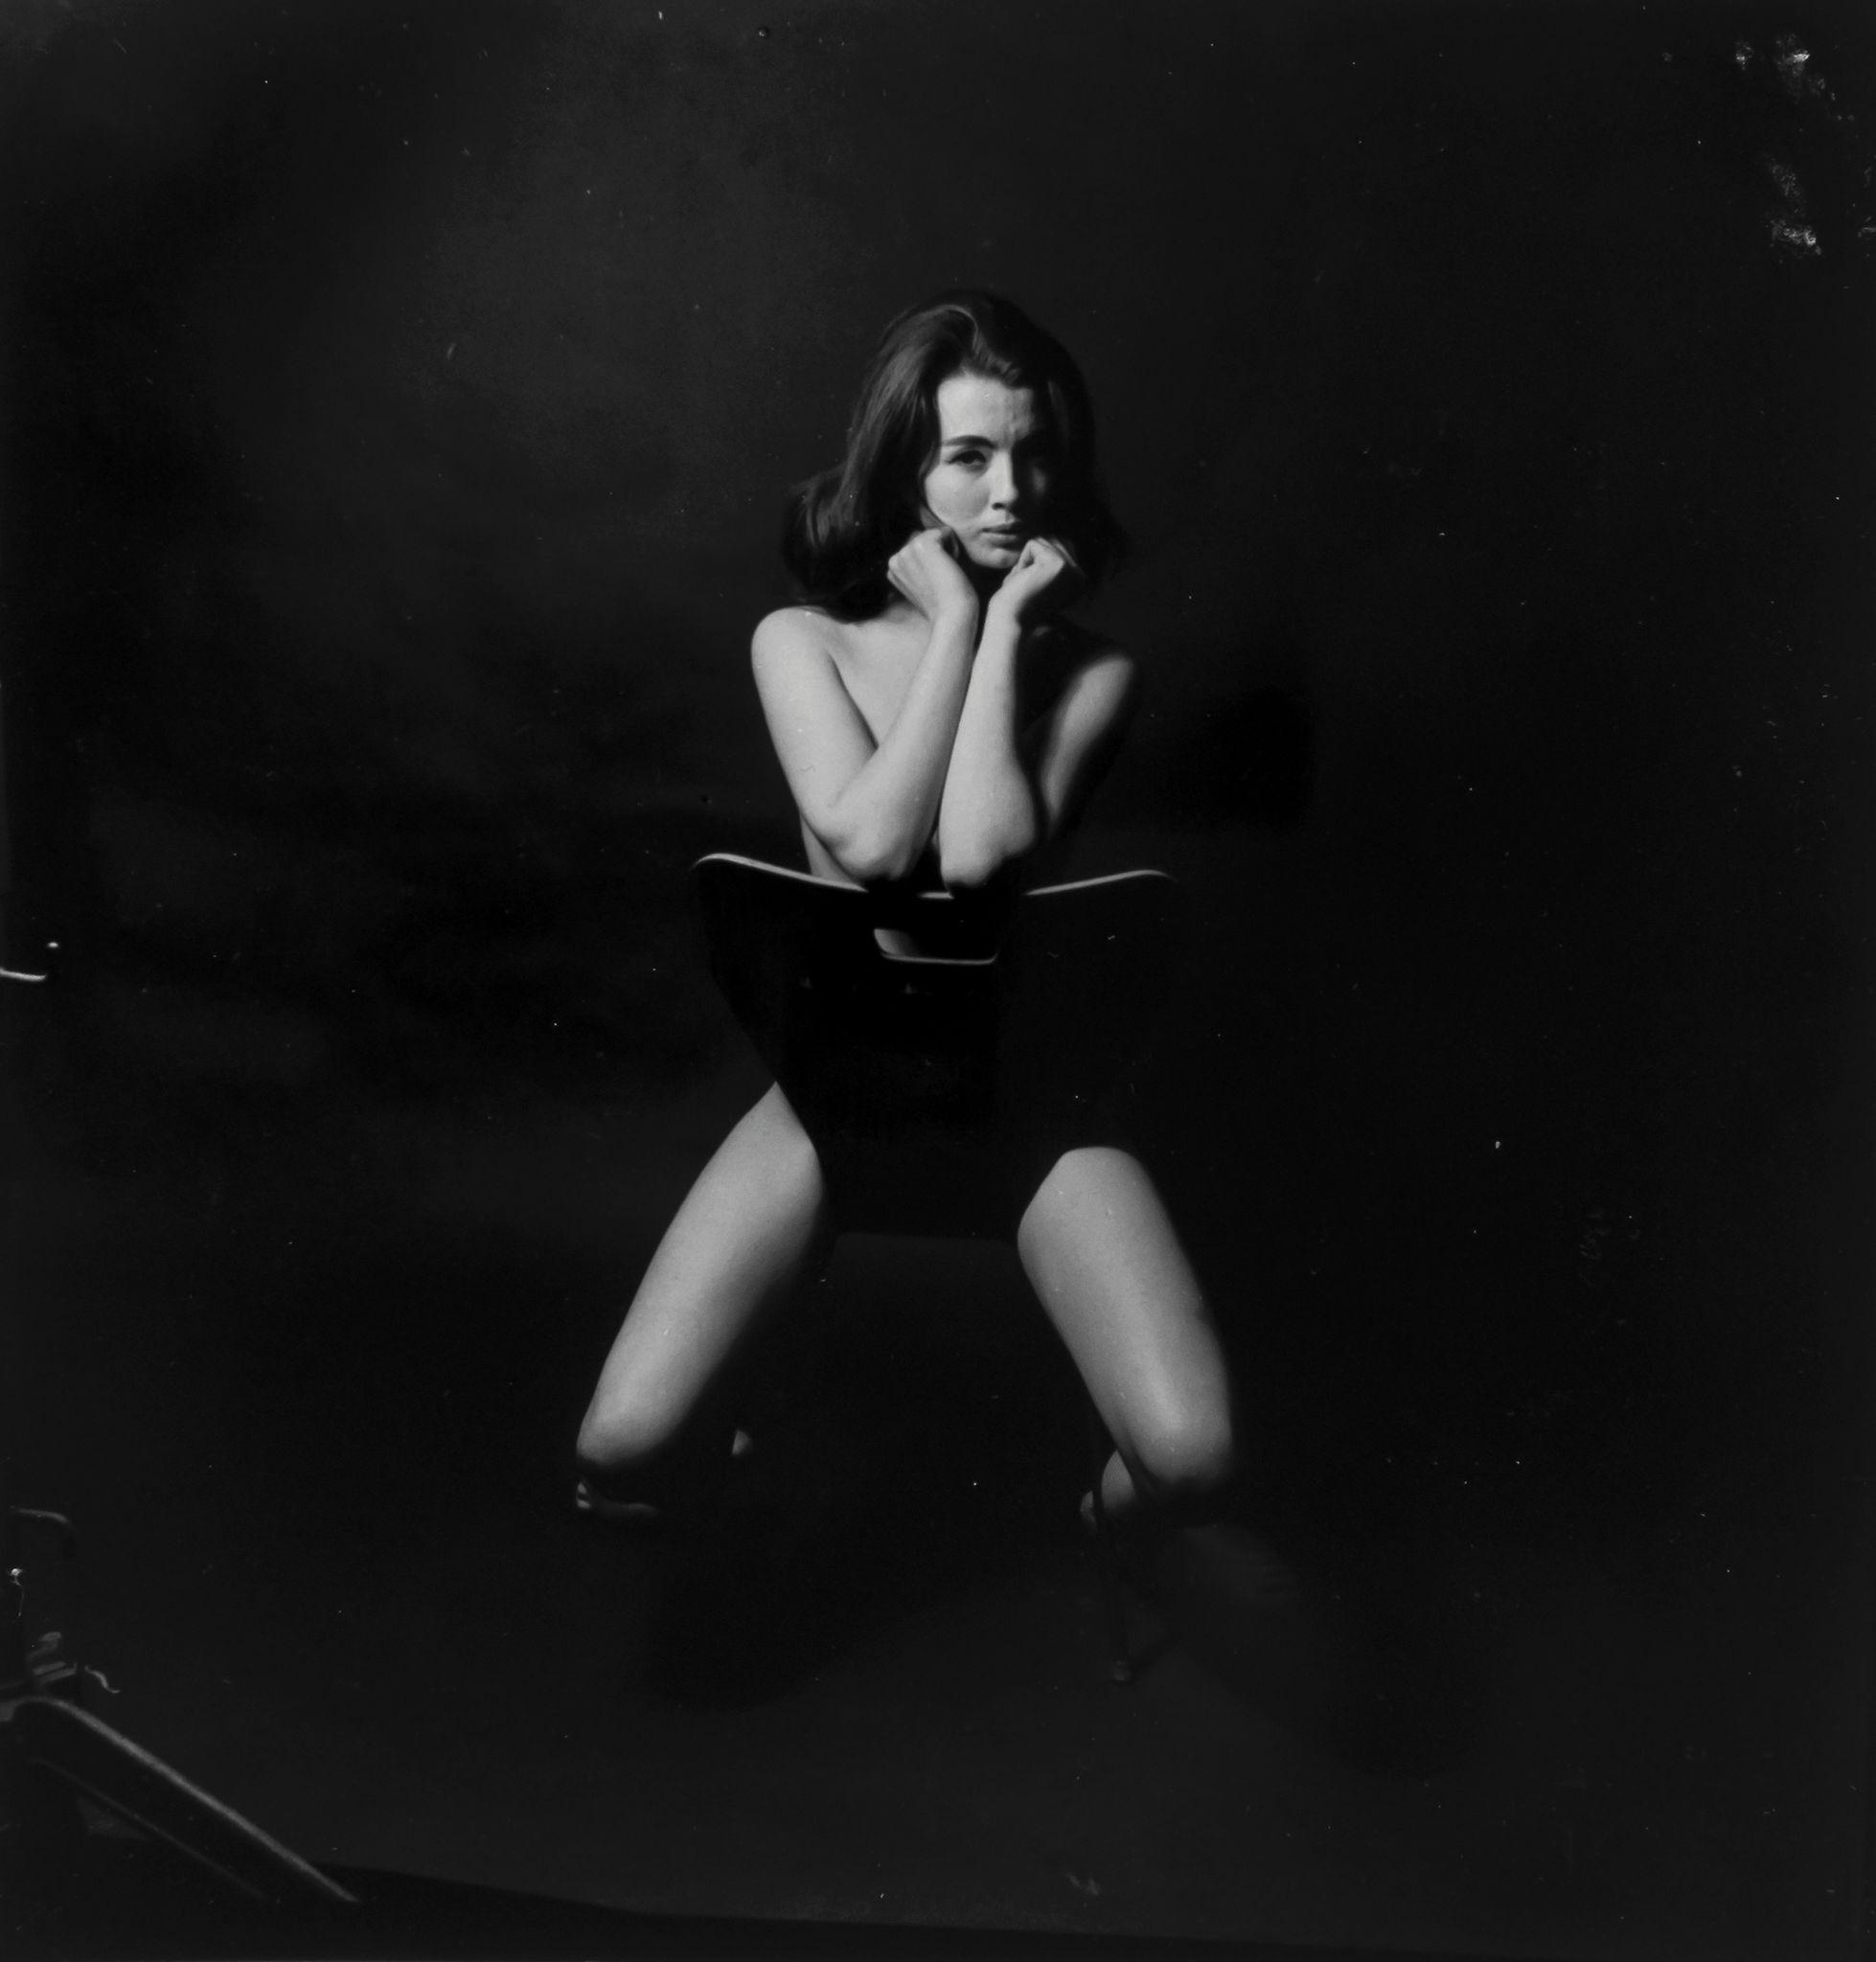 Фото девушки верхом на стуле 4 фотография